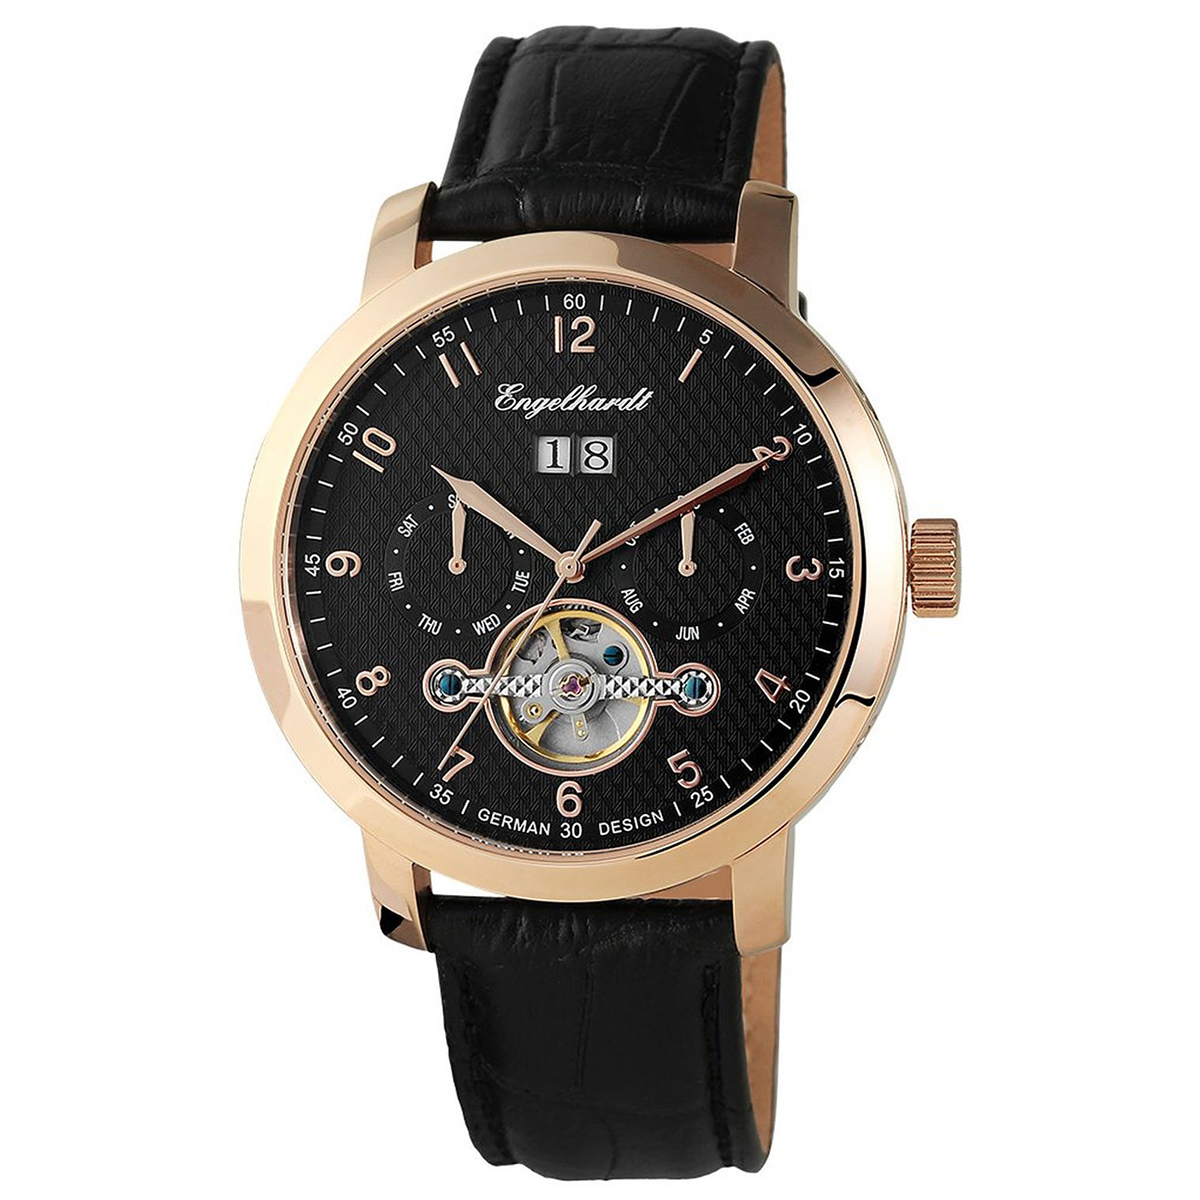 Engelhardt エンゲルハート 自動巻き 腕時計 メンズ ドイツ製 [388931029008] 並行輸入品 メーカー保証24ヵ月 純正ケース付き